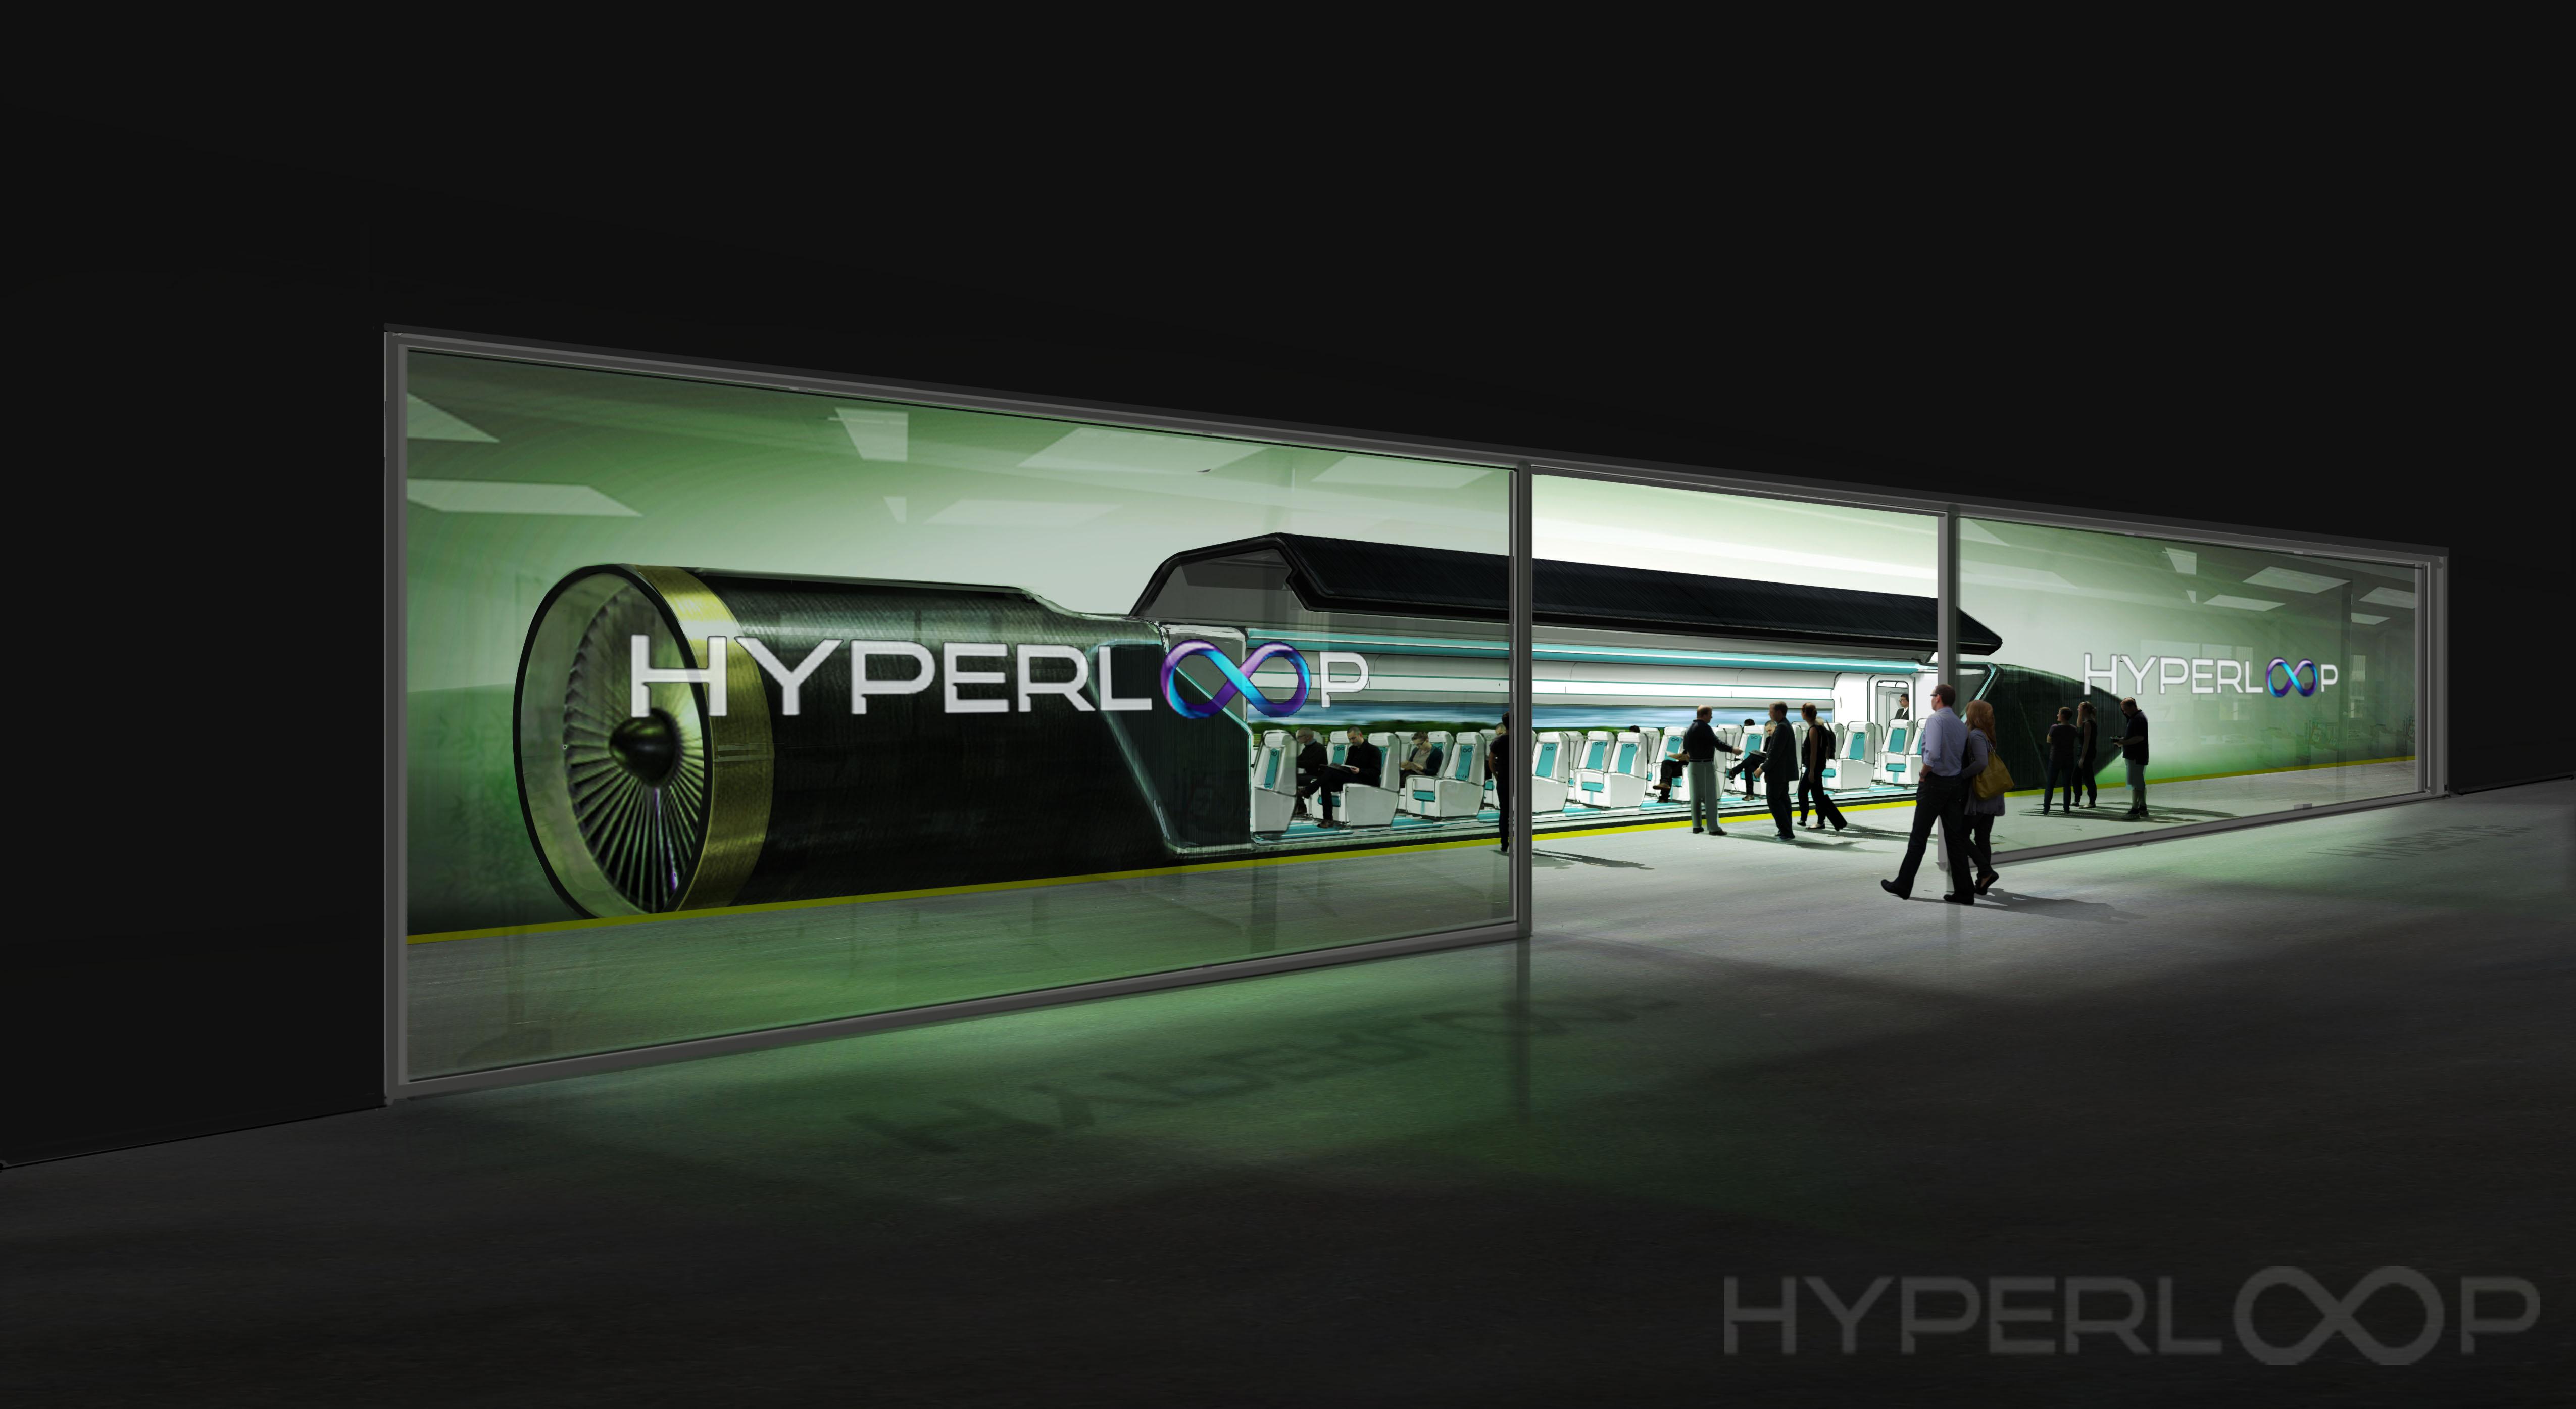 hyperlooppassengersboarding